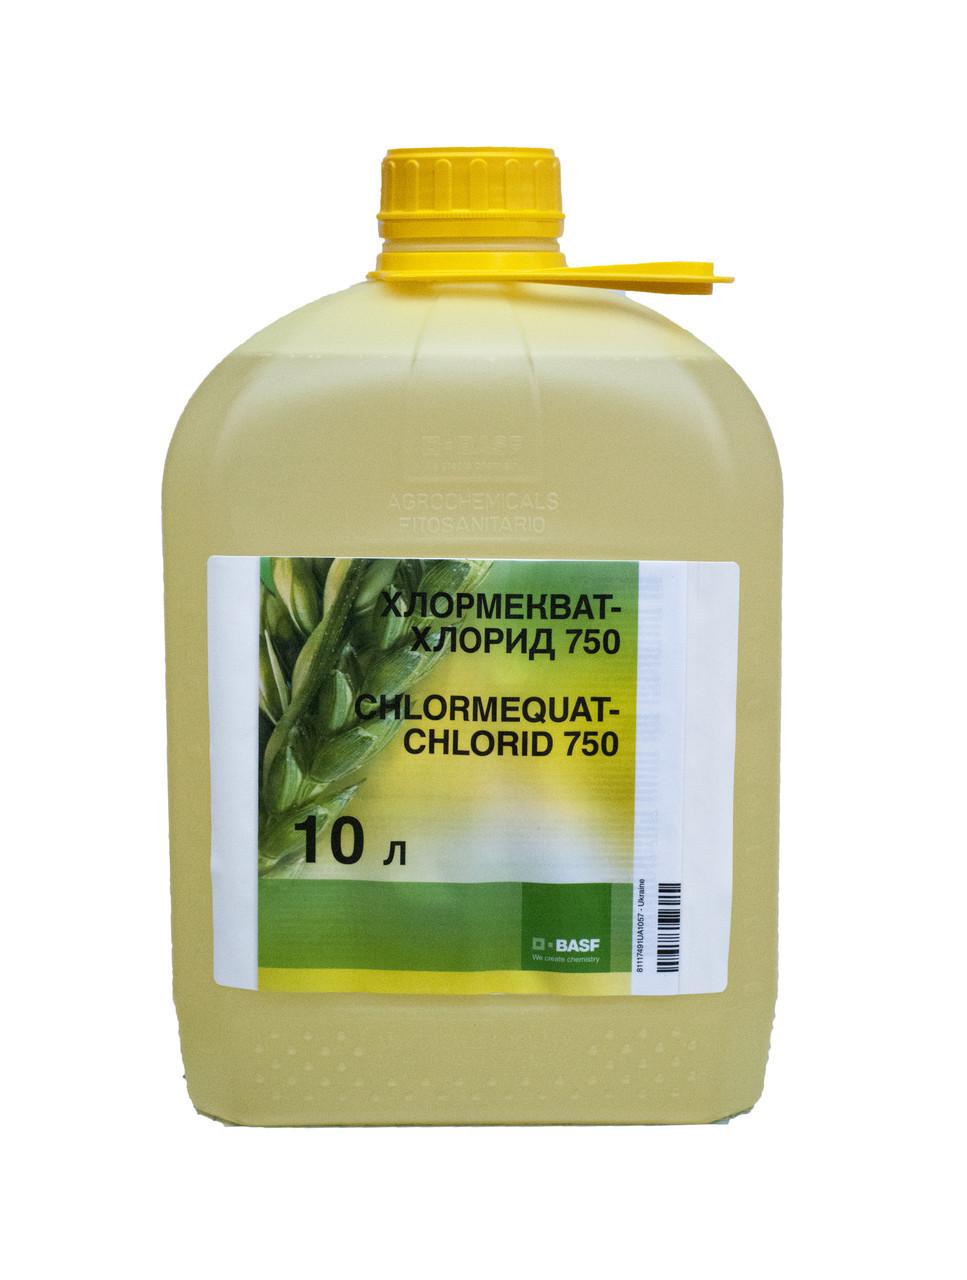 Регулятор роста Хлормекват-Хлорид, 10 л